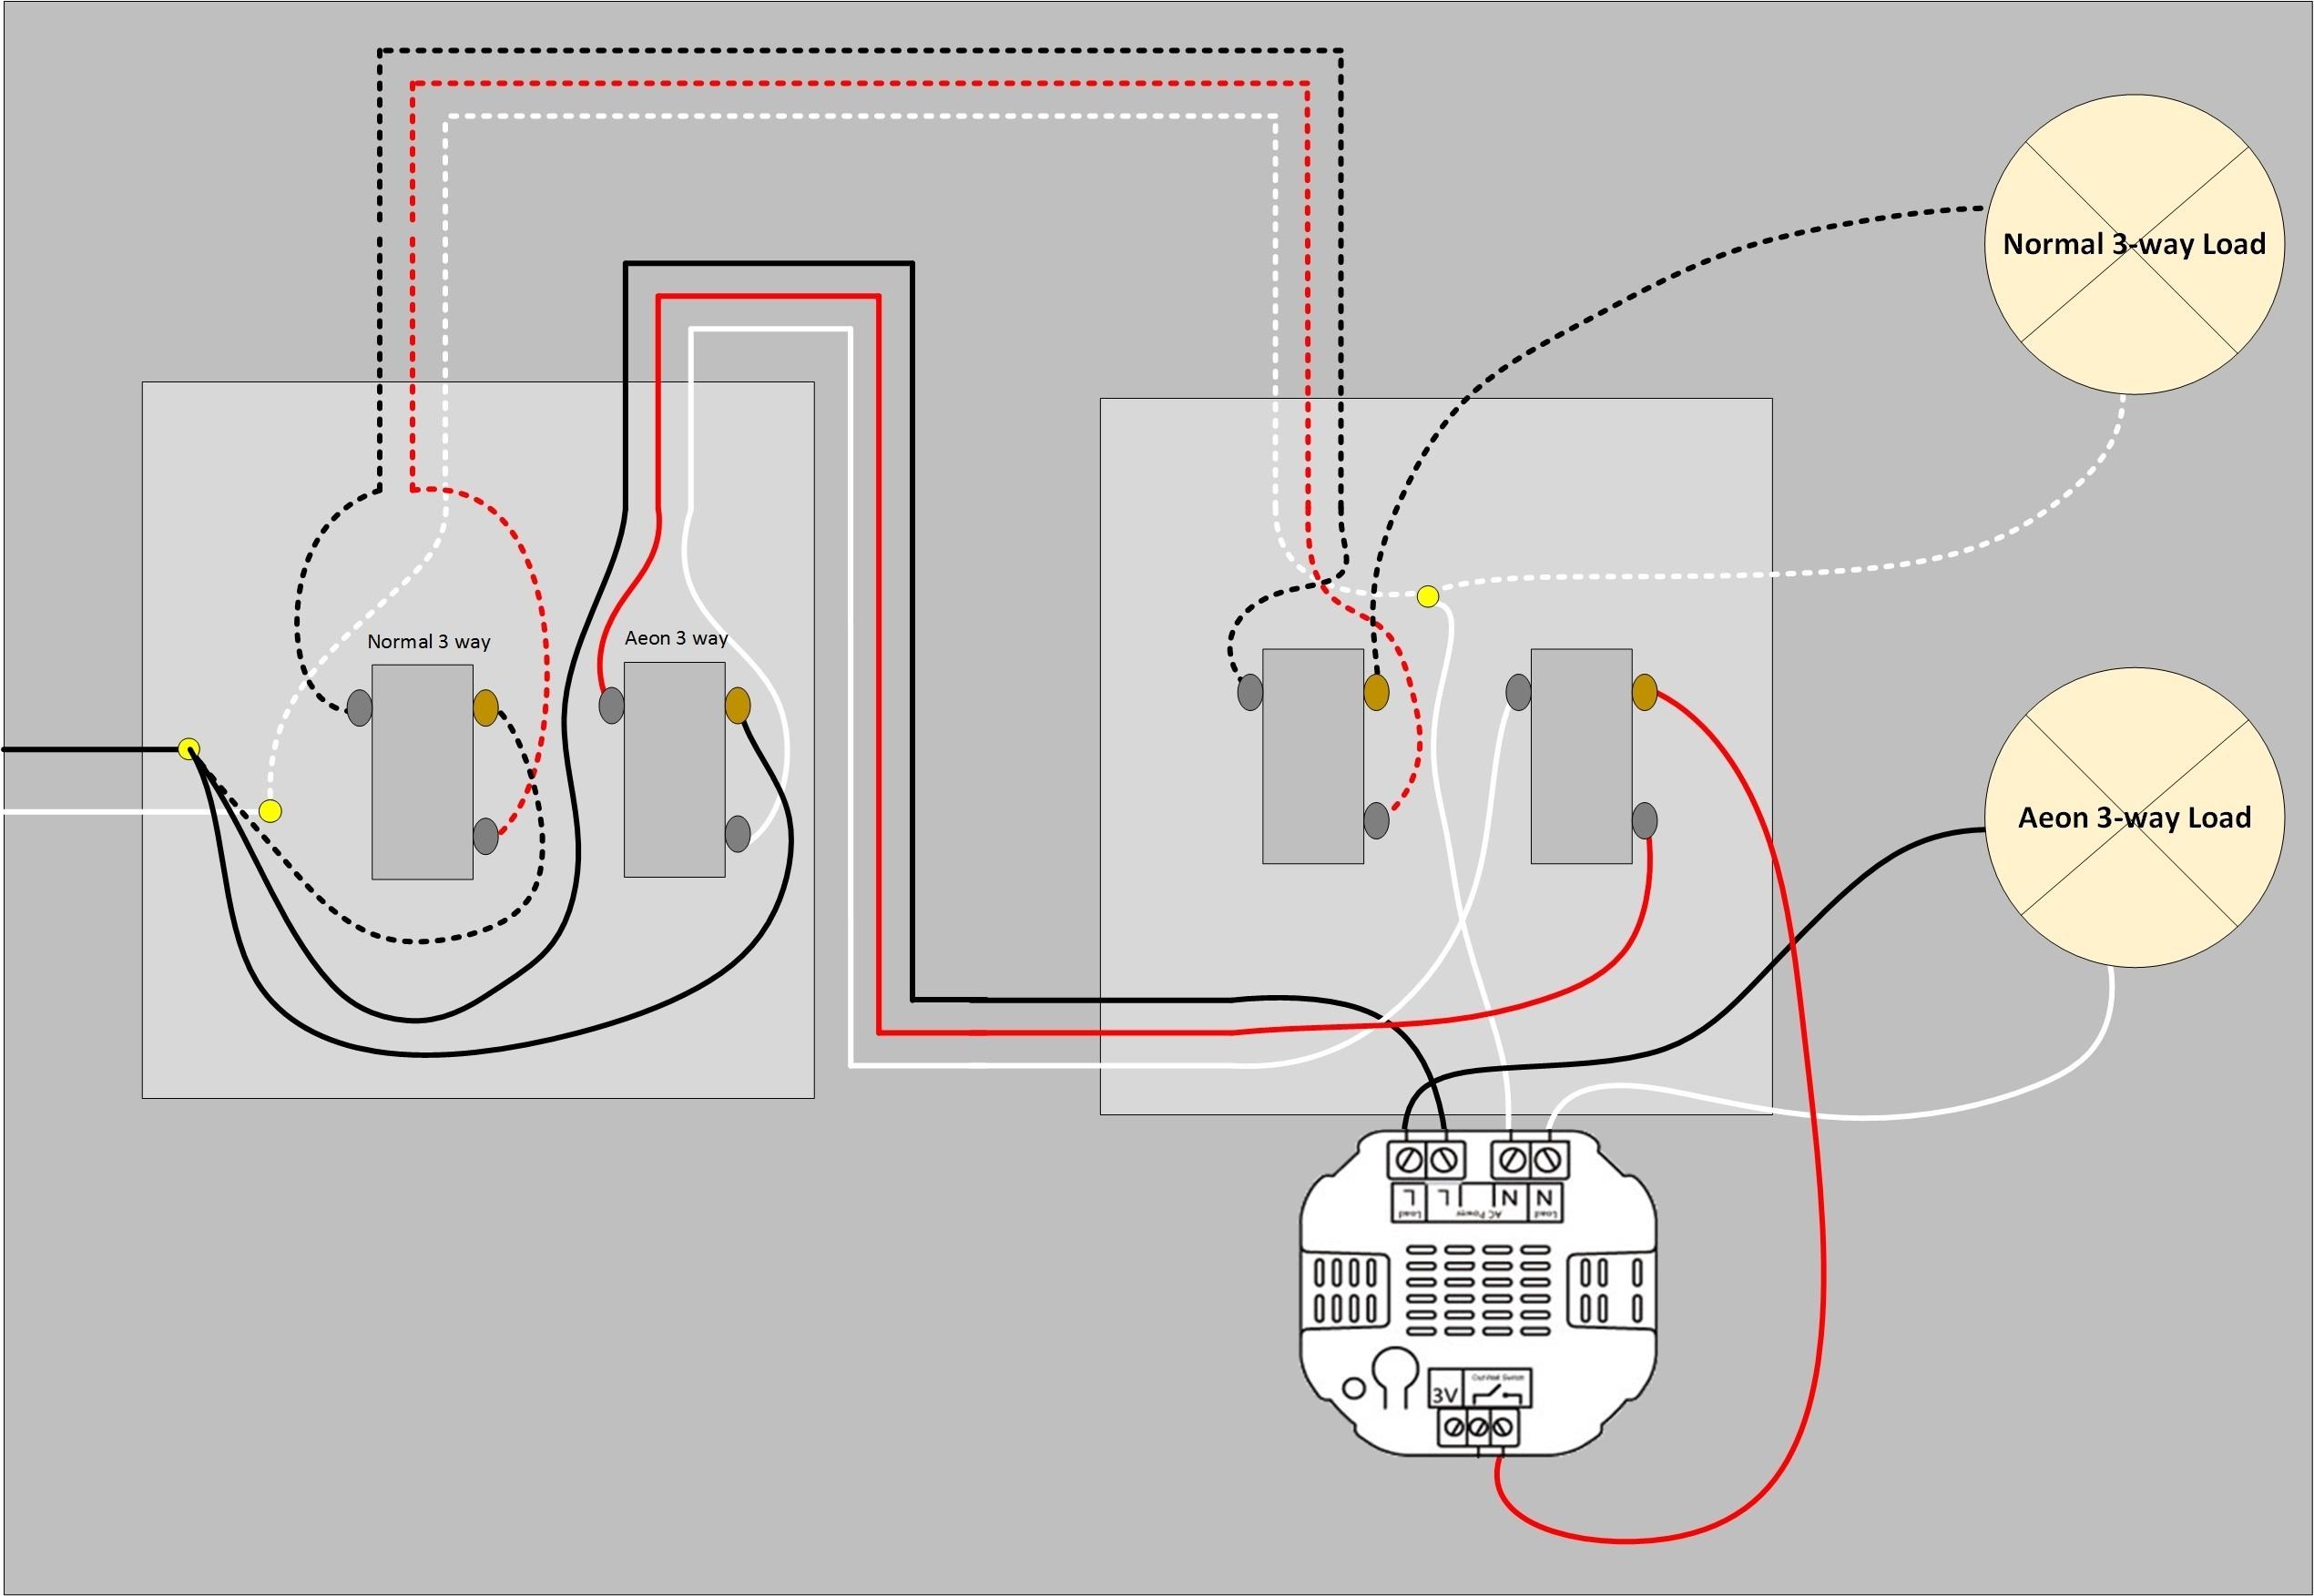 Leviton Decora 3 Way Switch Wiring Diagram 5603 10b02 Leviton Decora 3 Way Switch Wiring Diagram 5603 Of Leviton Decora 3 Way Switch Wiring Diagram 5603